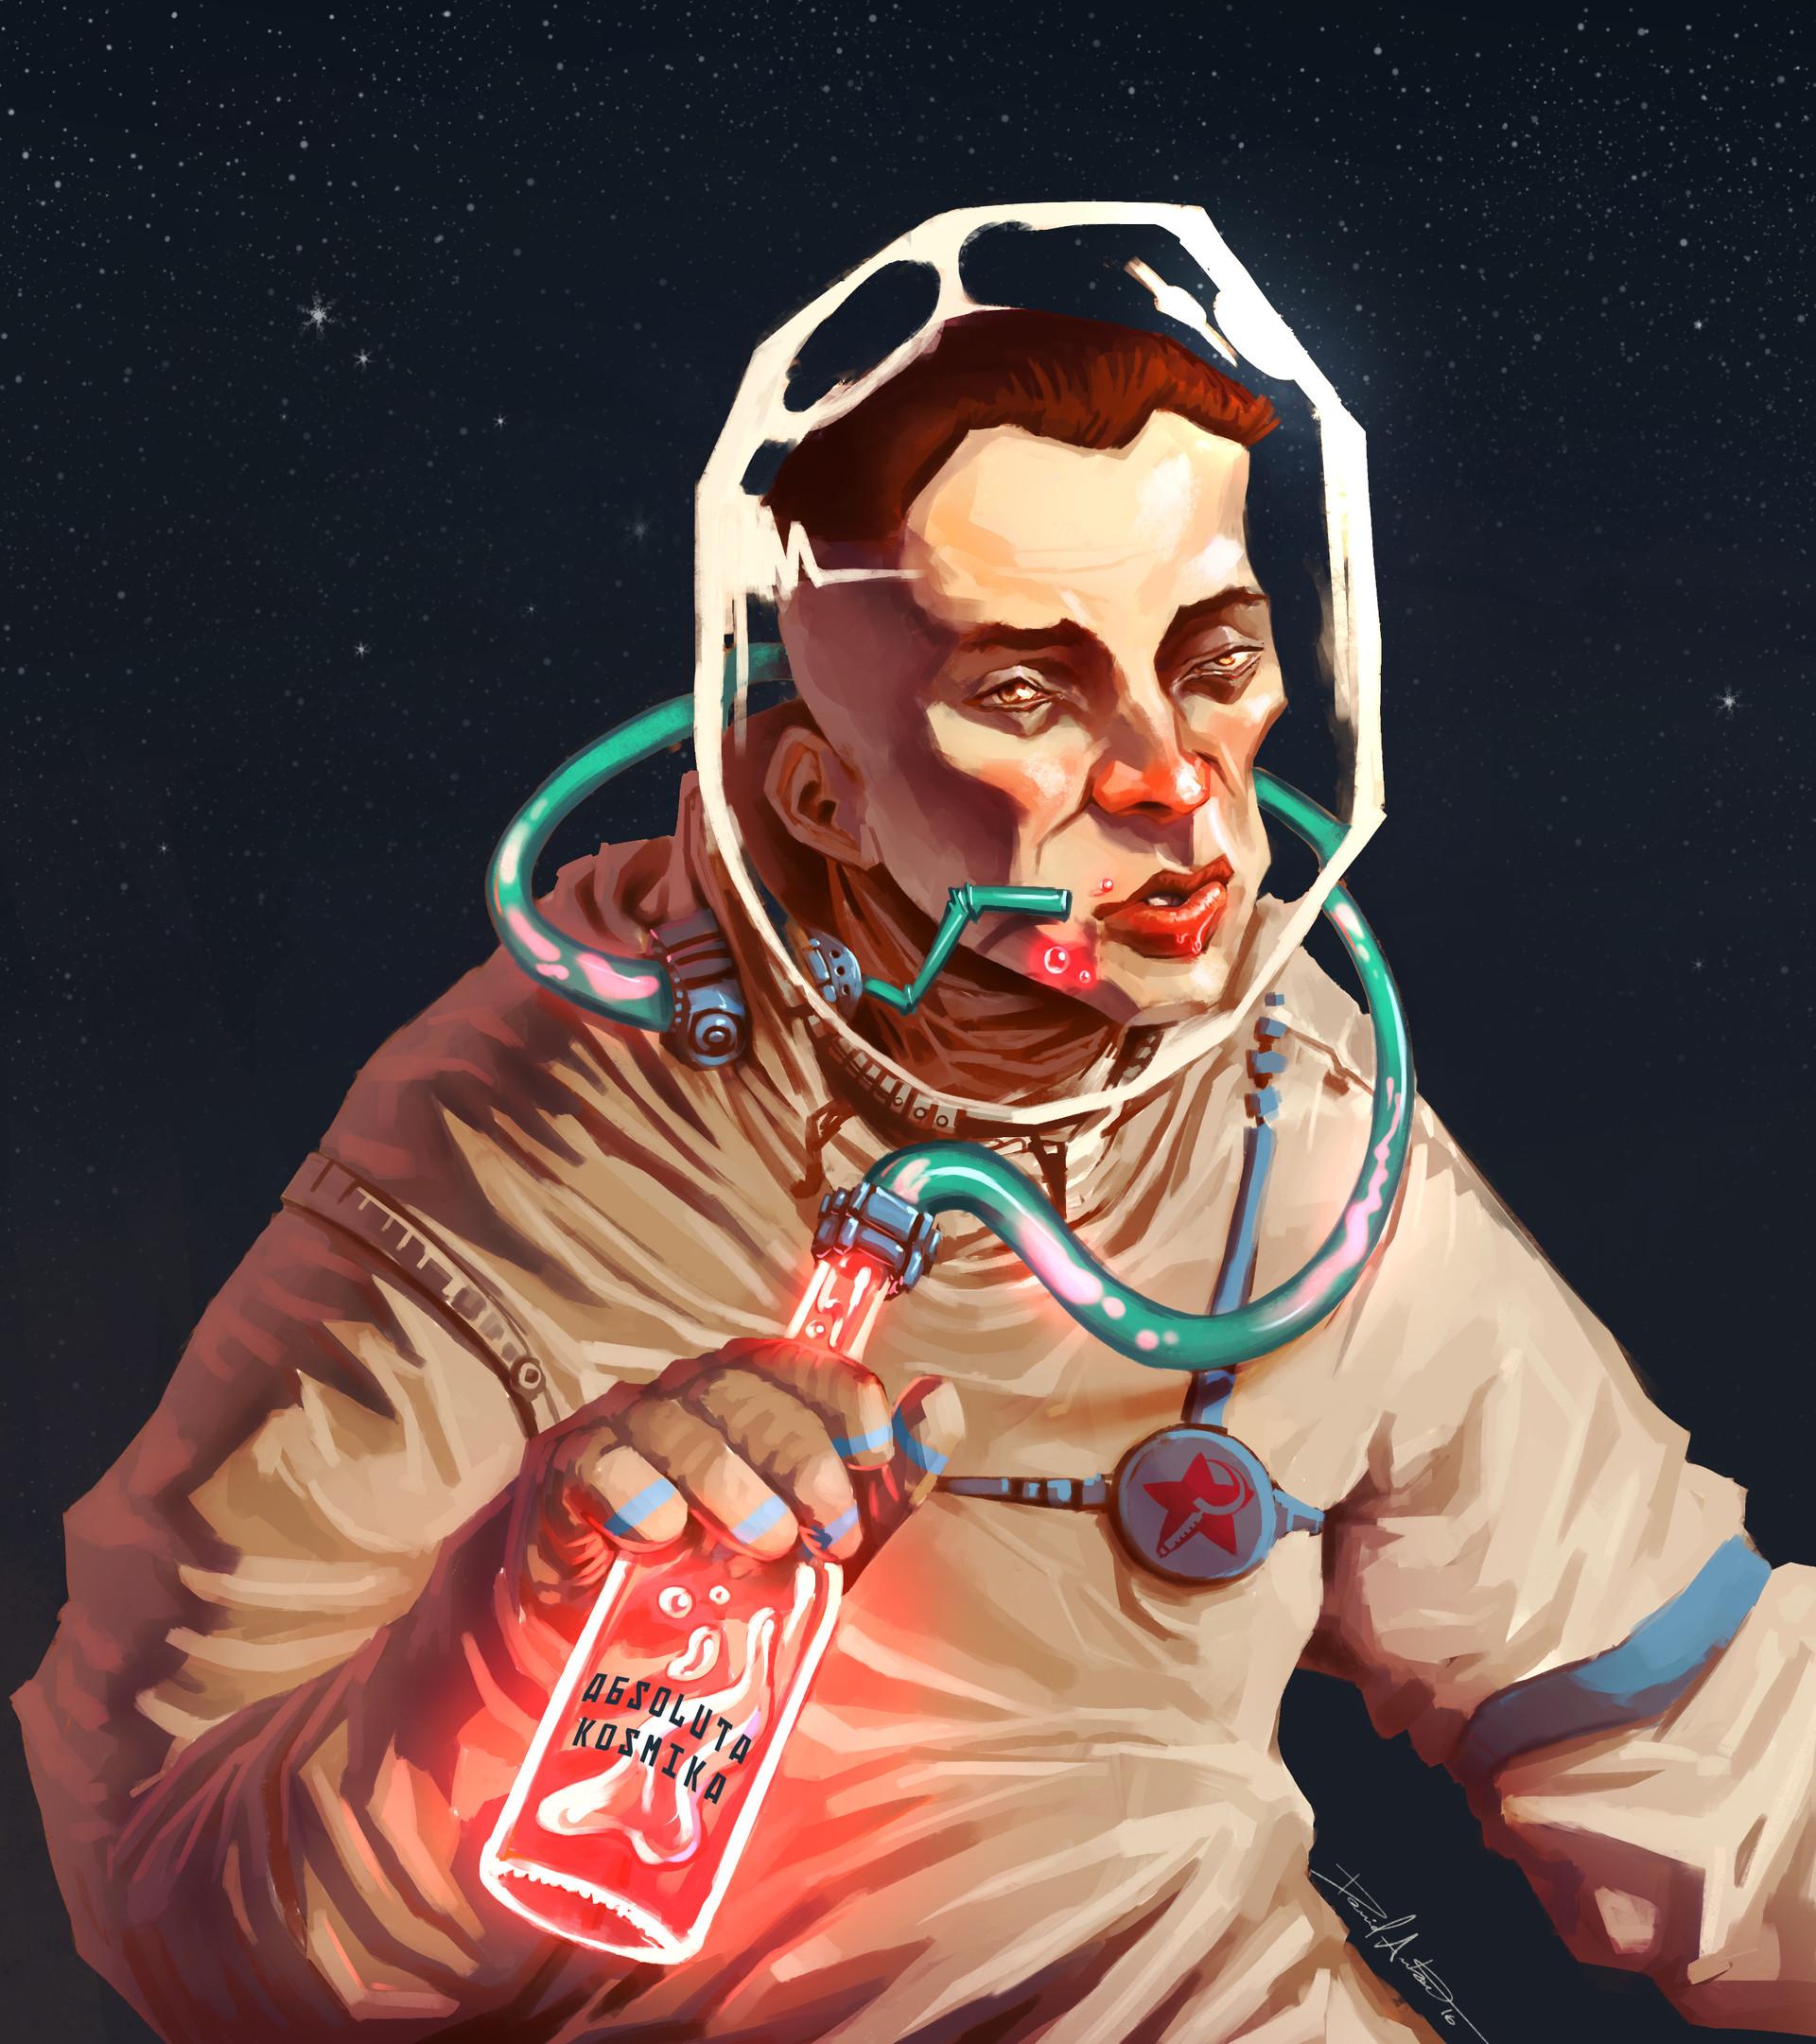 Daniel aubert drunk astronaut 2 copy